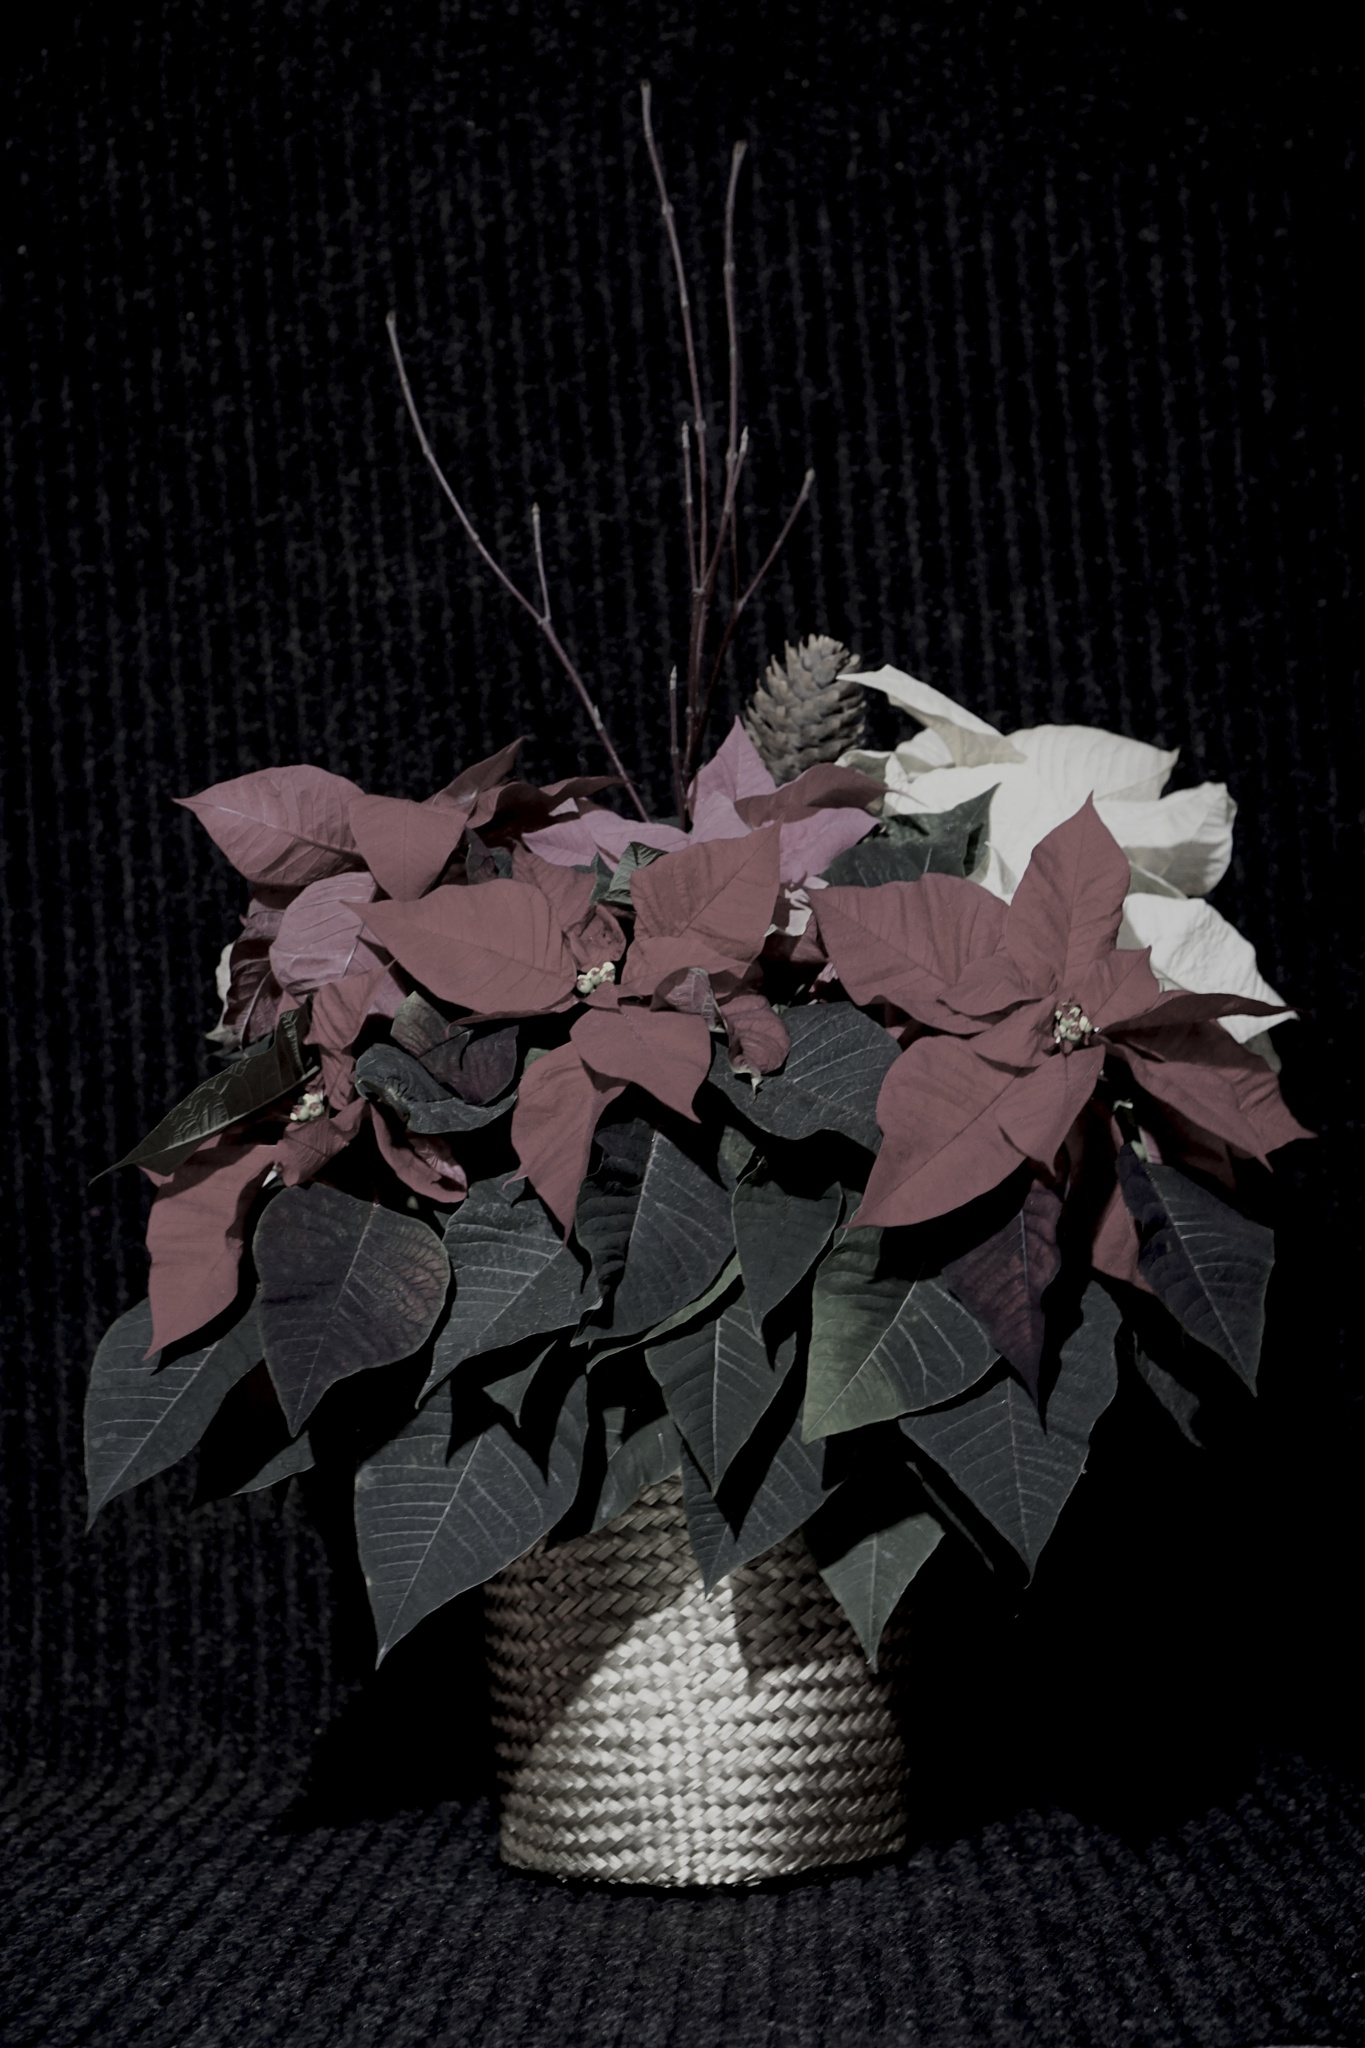 Christmas flowers by Loki17